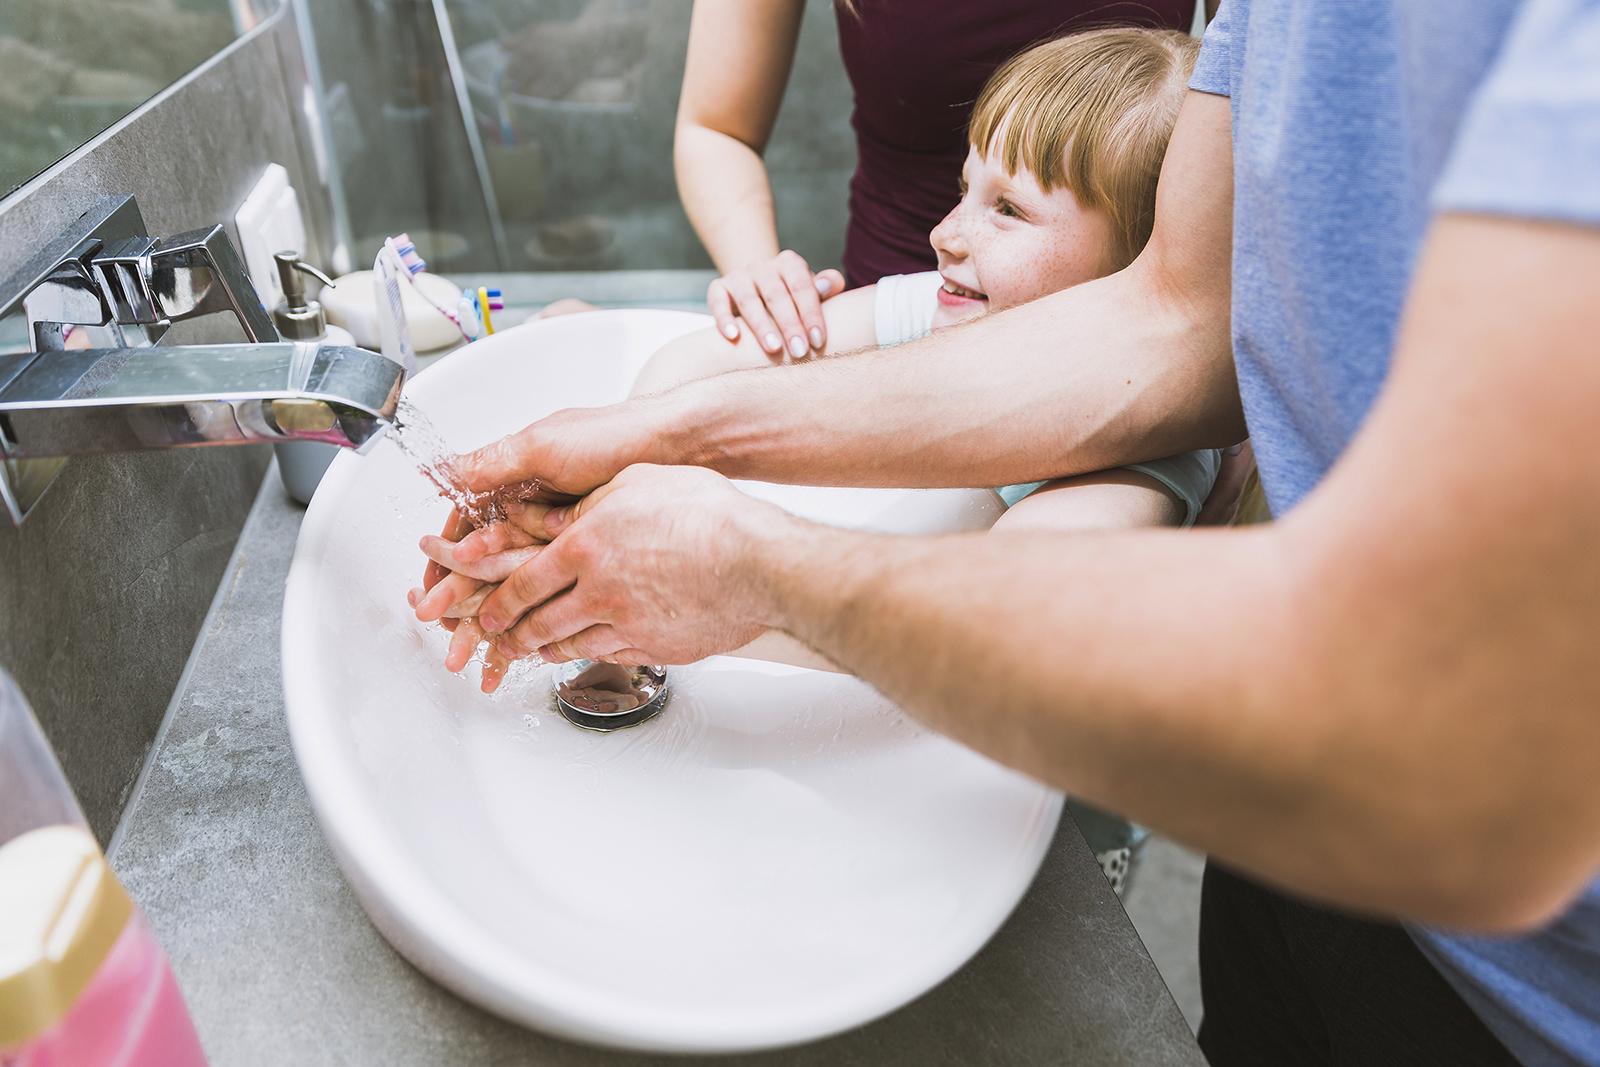 Umivajmo roke za naše zdravje